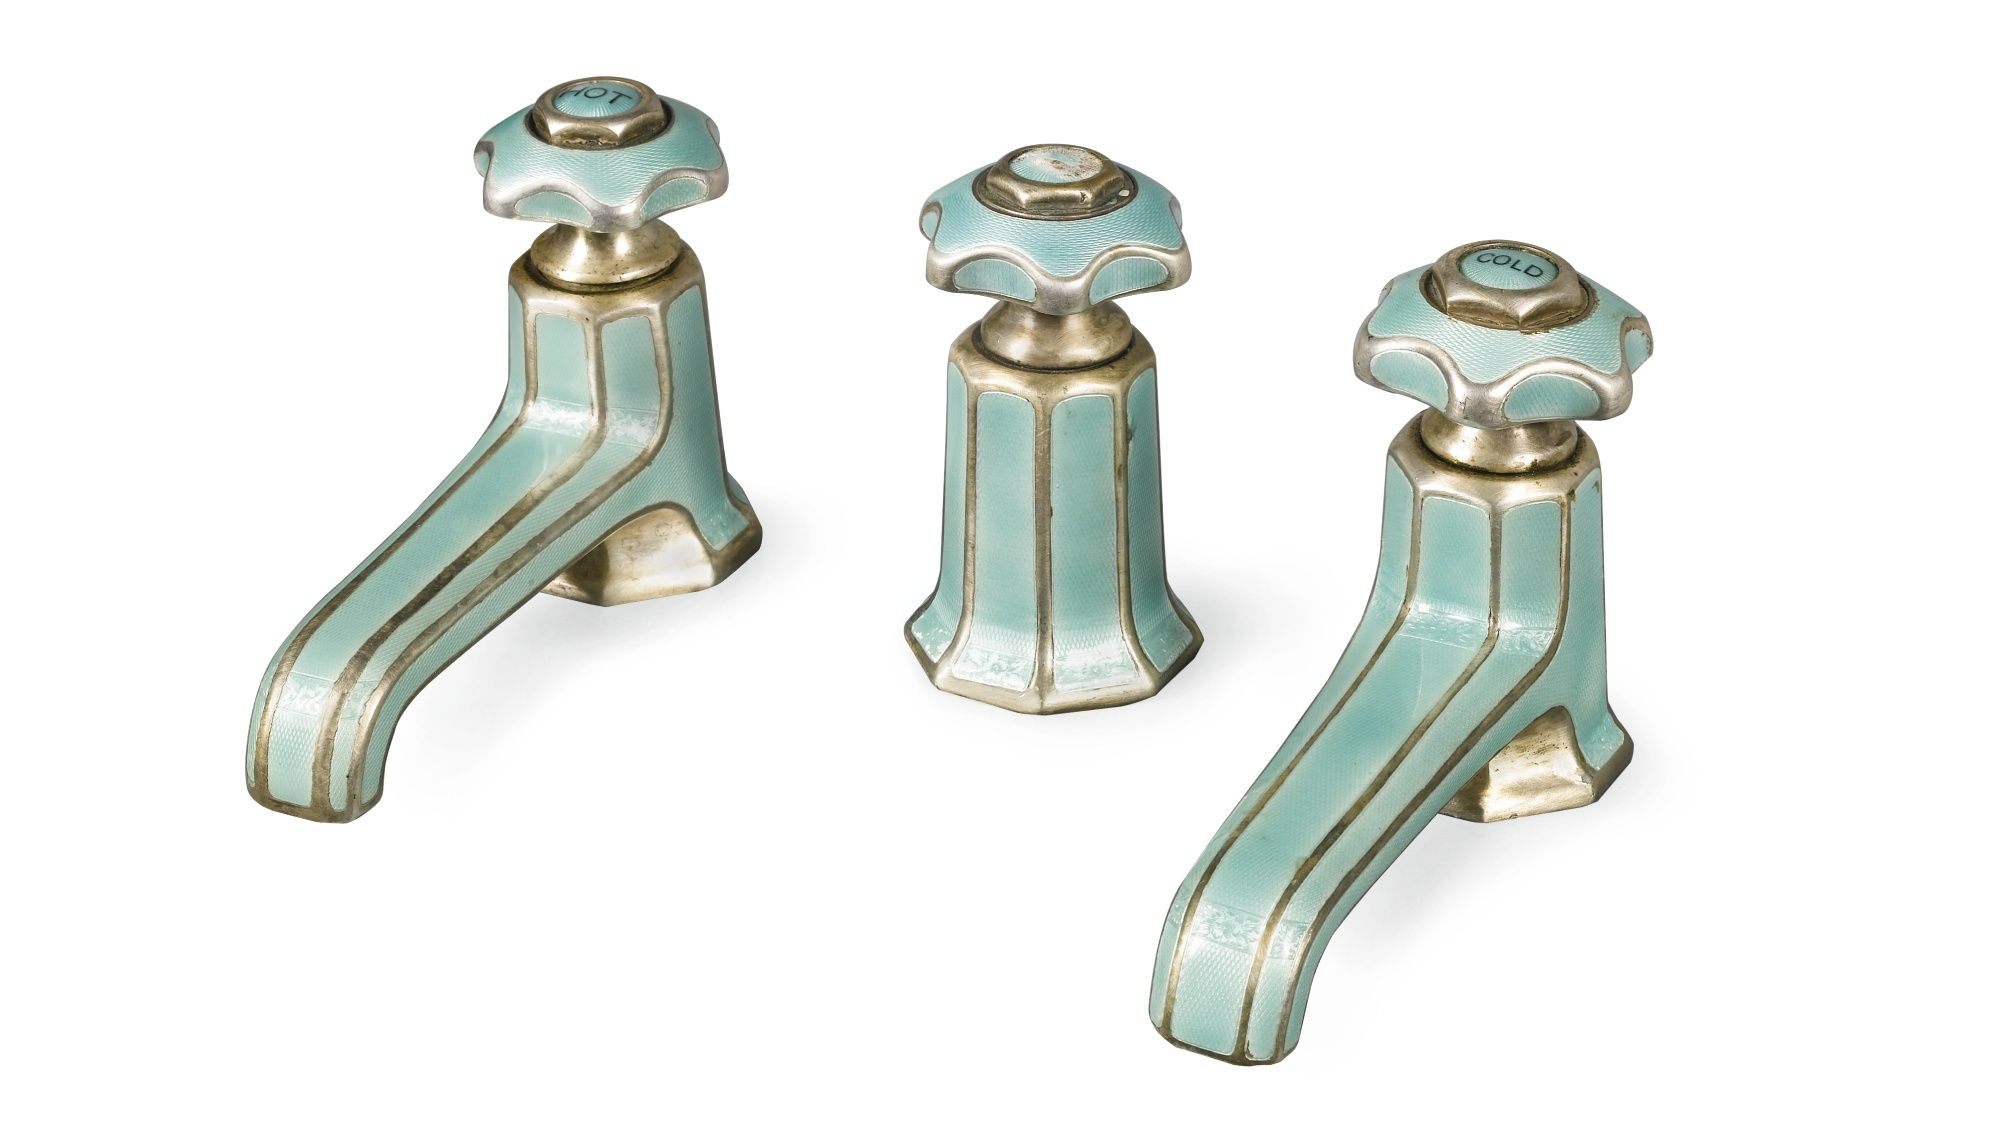 enamelled Art Deco bath taps | Houseware | Pinterest | Art deco ...